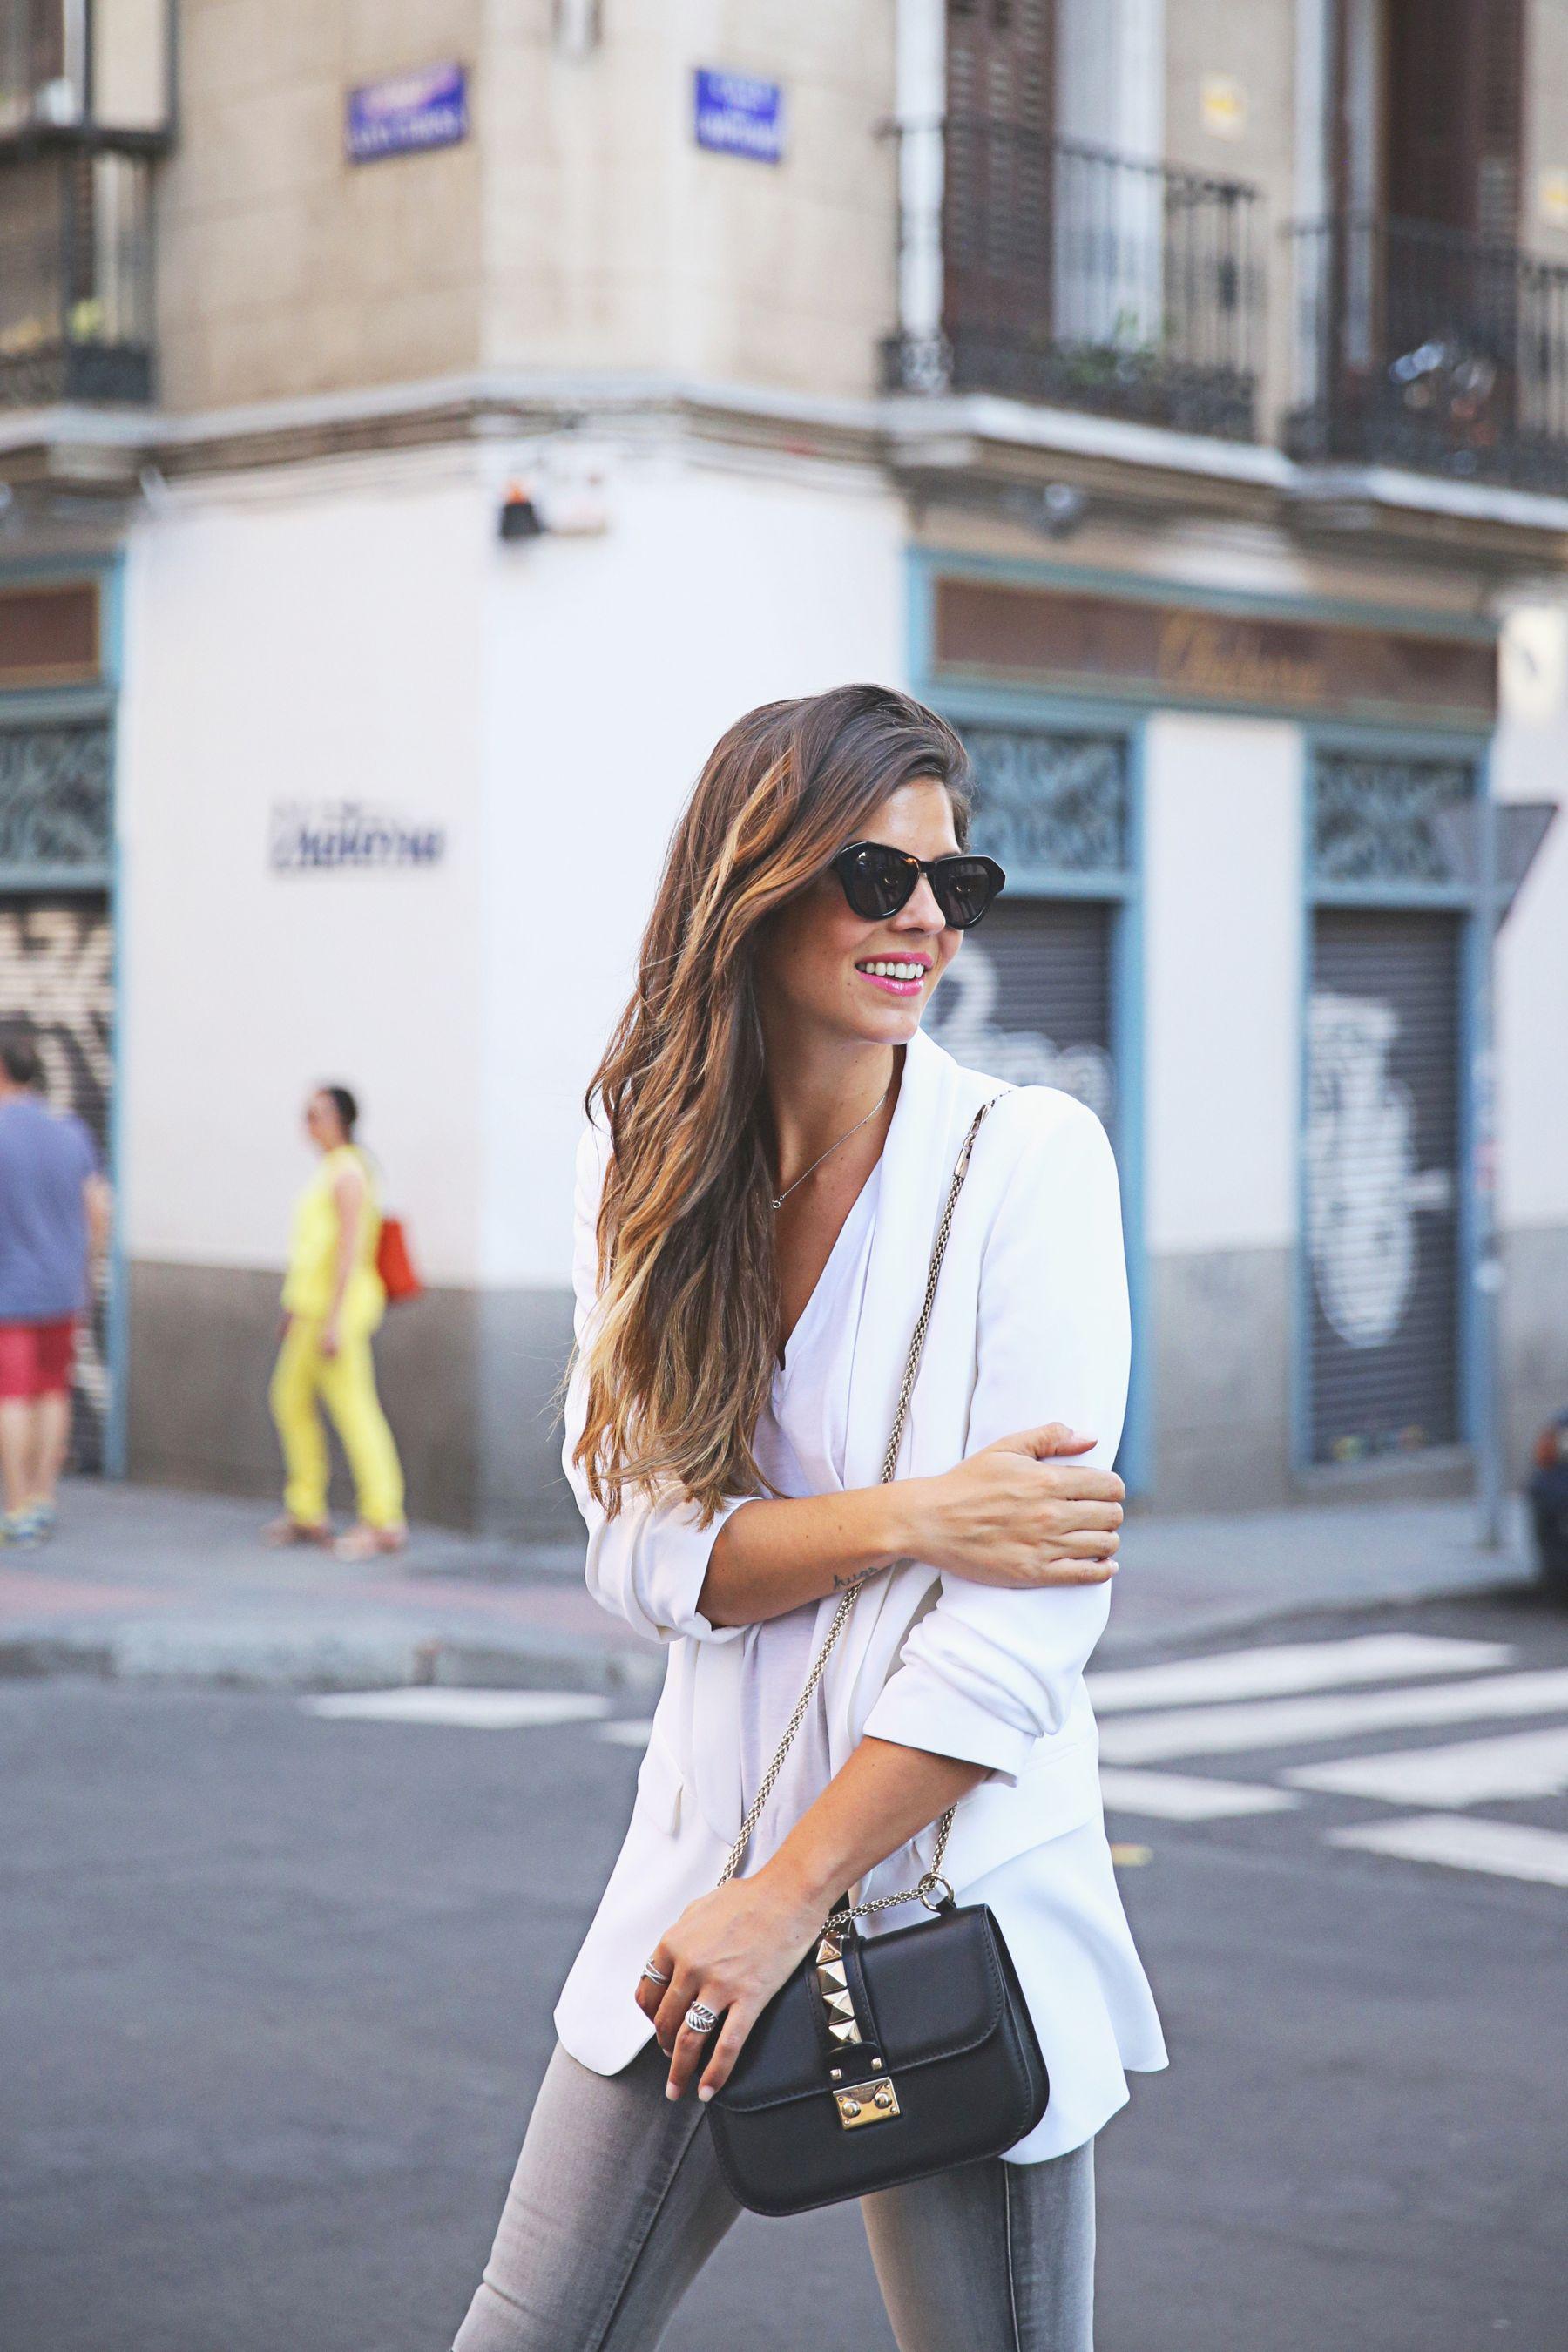 trendy-taste-look-outfit-street-style-ootd-blog-blogger-fashion-spain-moda-españa-SS15-verano2015-tendencias-trends-zara-buylevard-valentino-jessica-simpson-skinny-jeans-grey-white-blazer-americana-blanca-vaqueros-pitillo-sandalias-sandals-etnicas-8